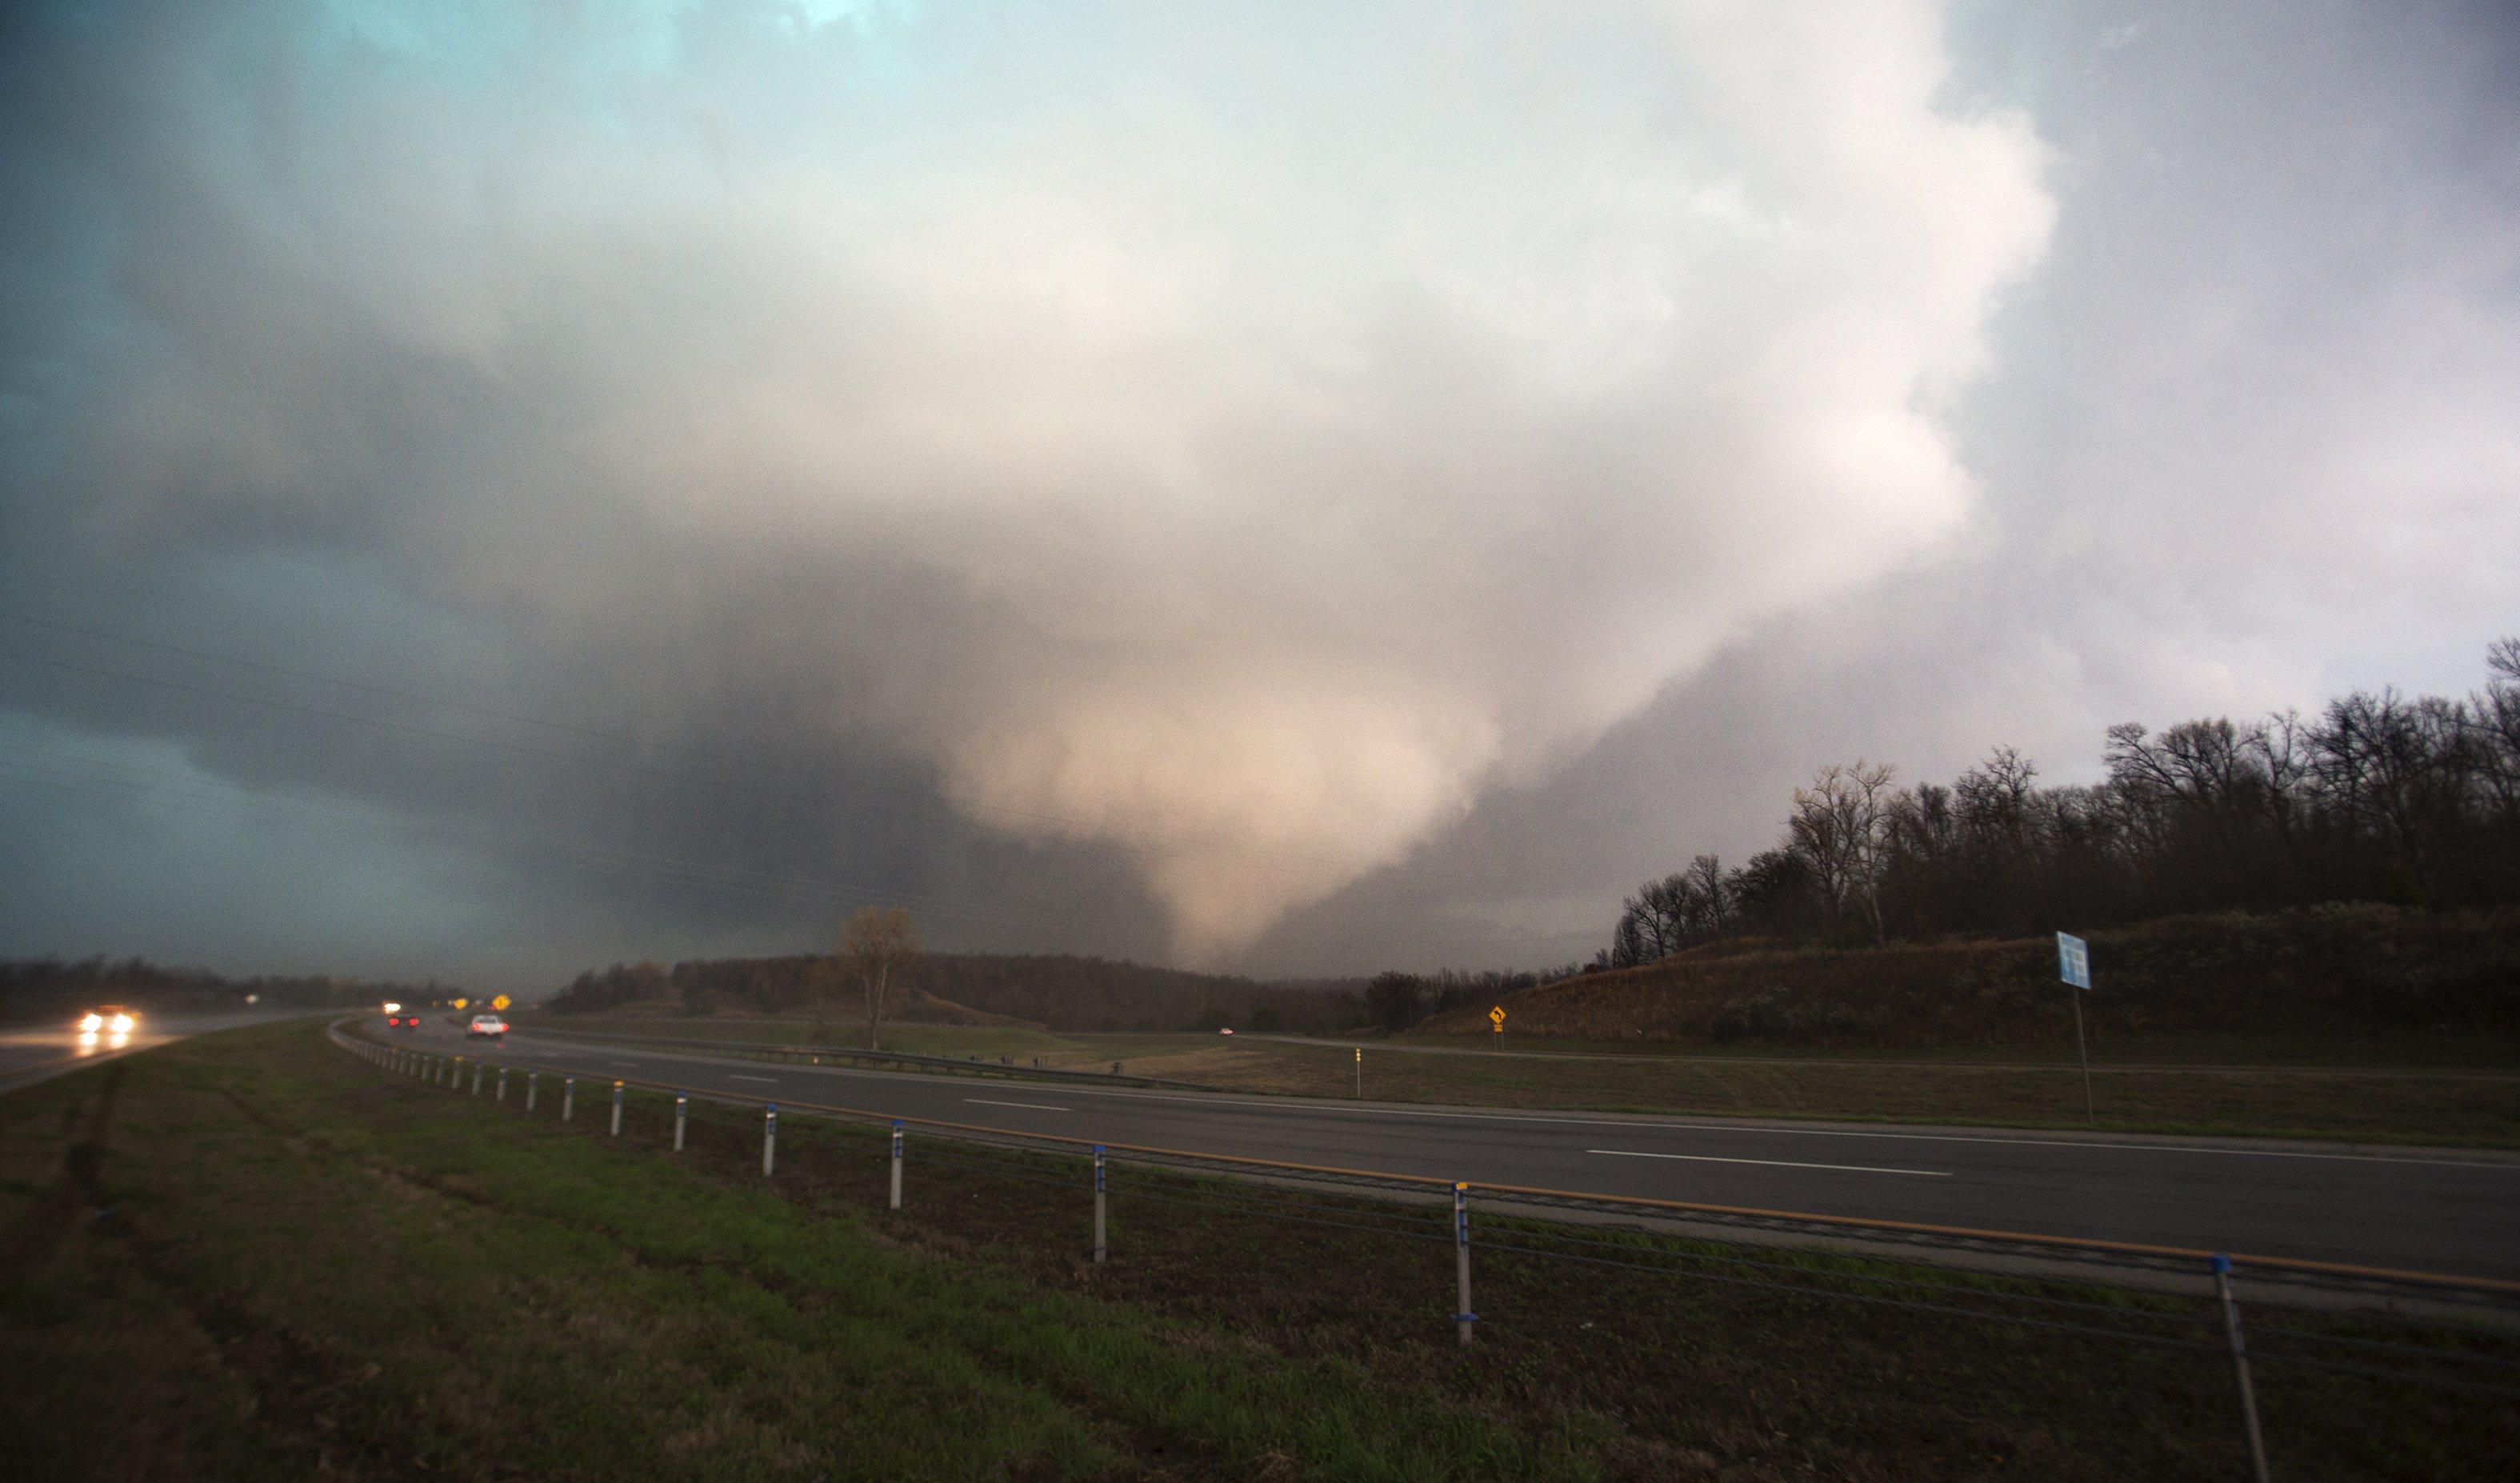 A Tornado is seen in Sand Springs, Okla. on March 25, 2015.